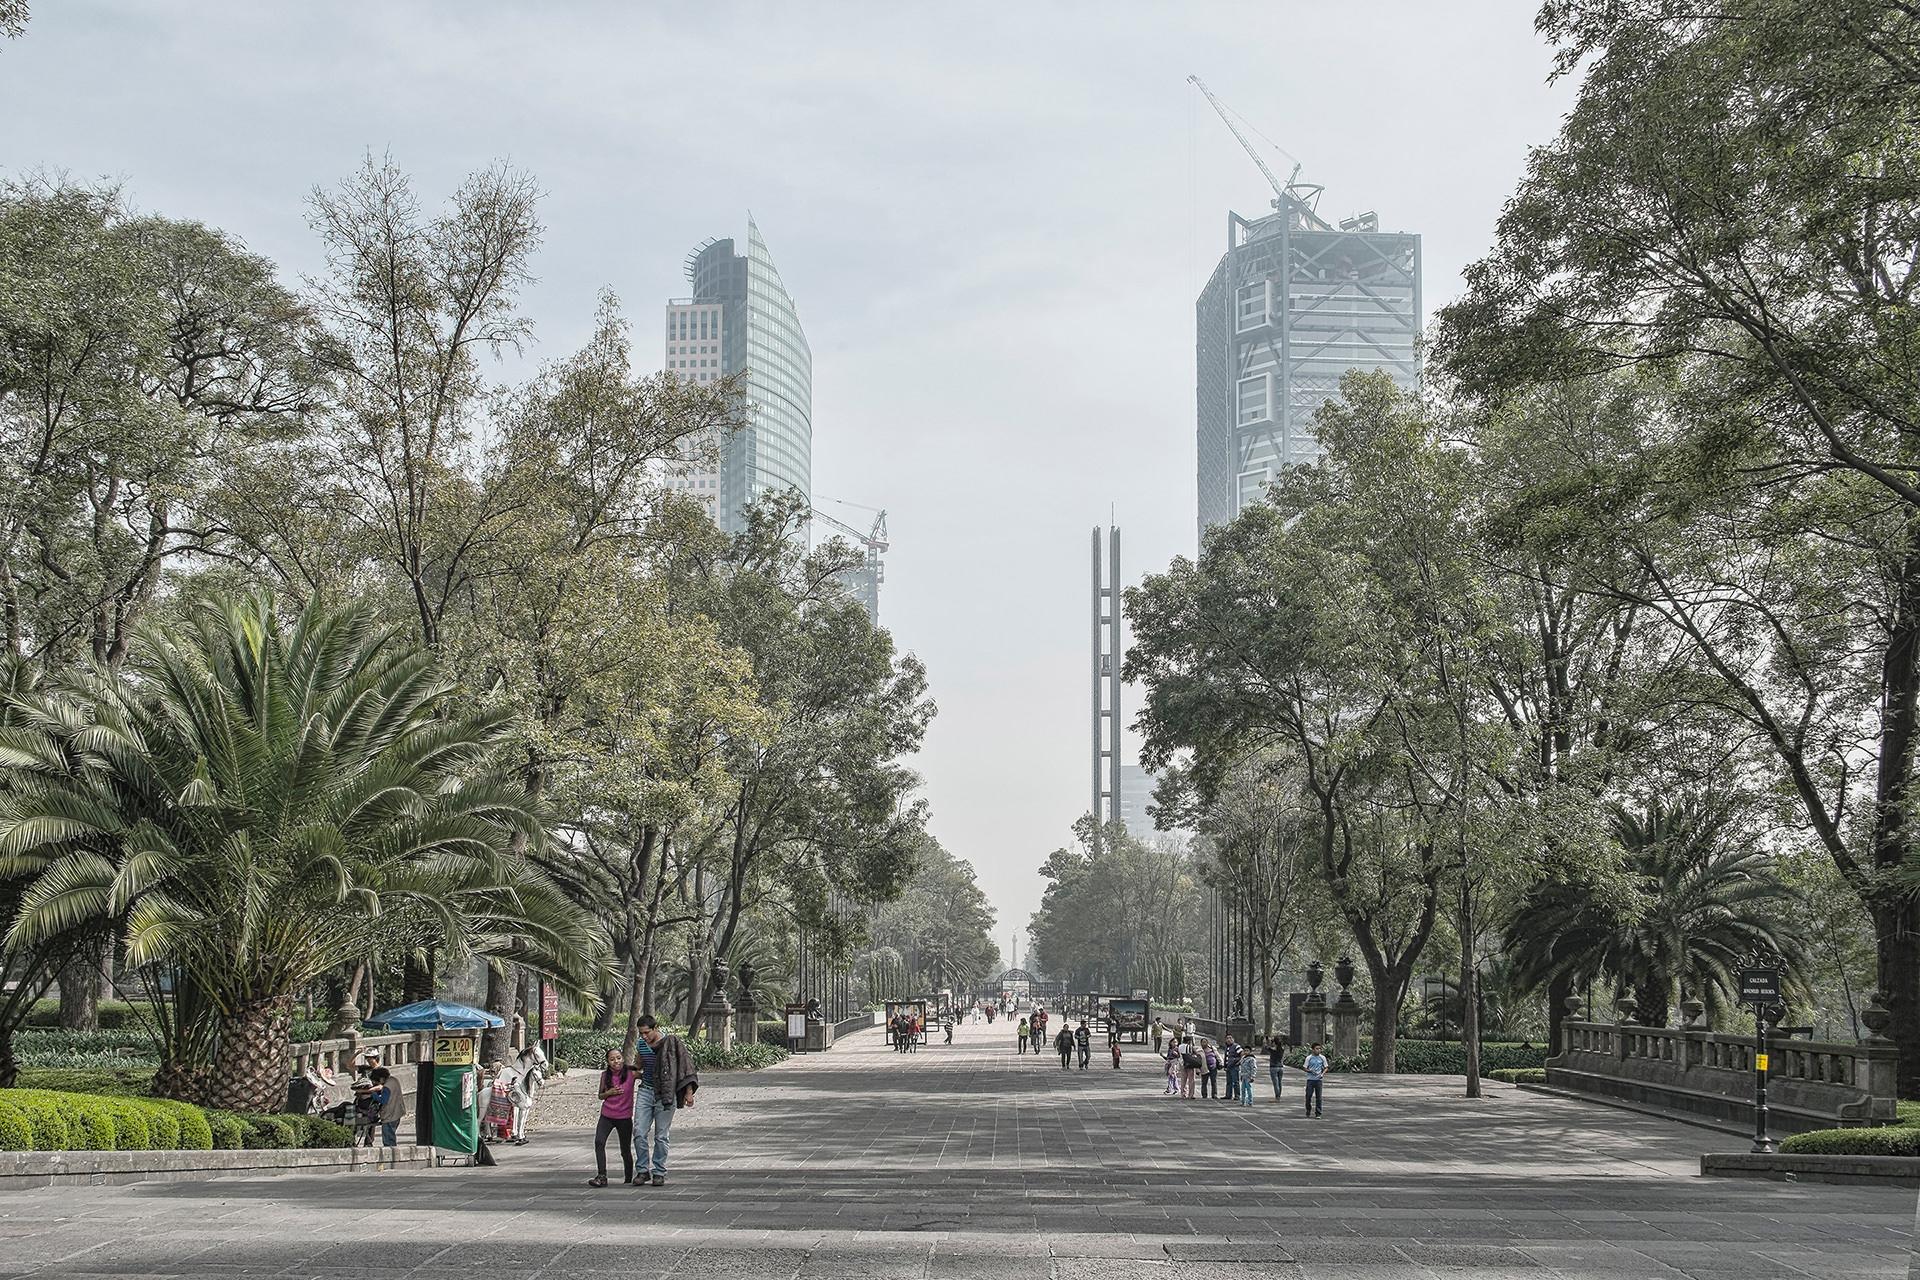 park of Chapultepec in Mexico City